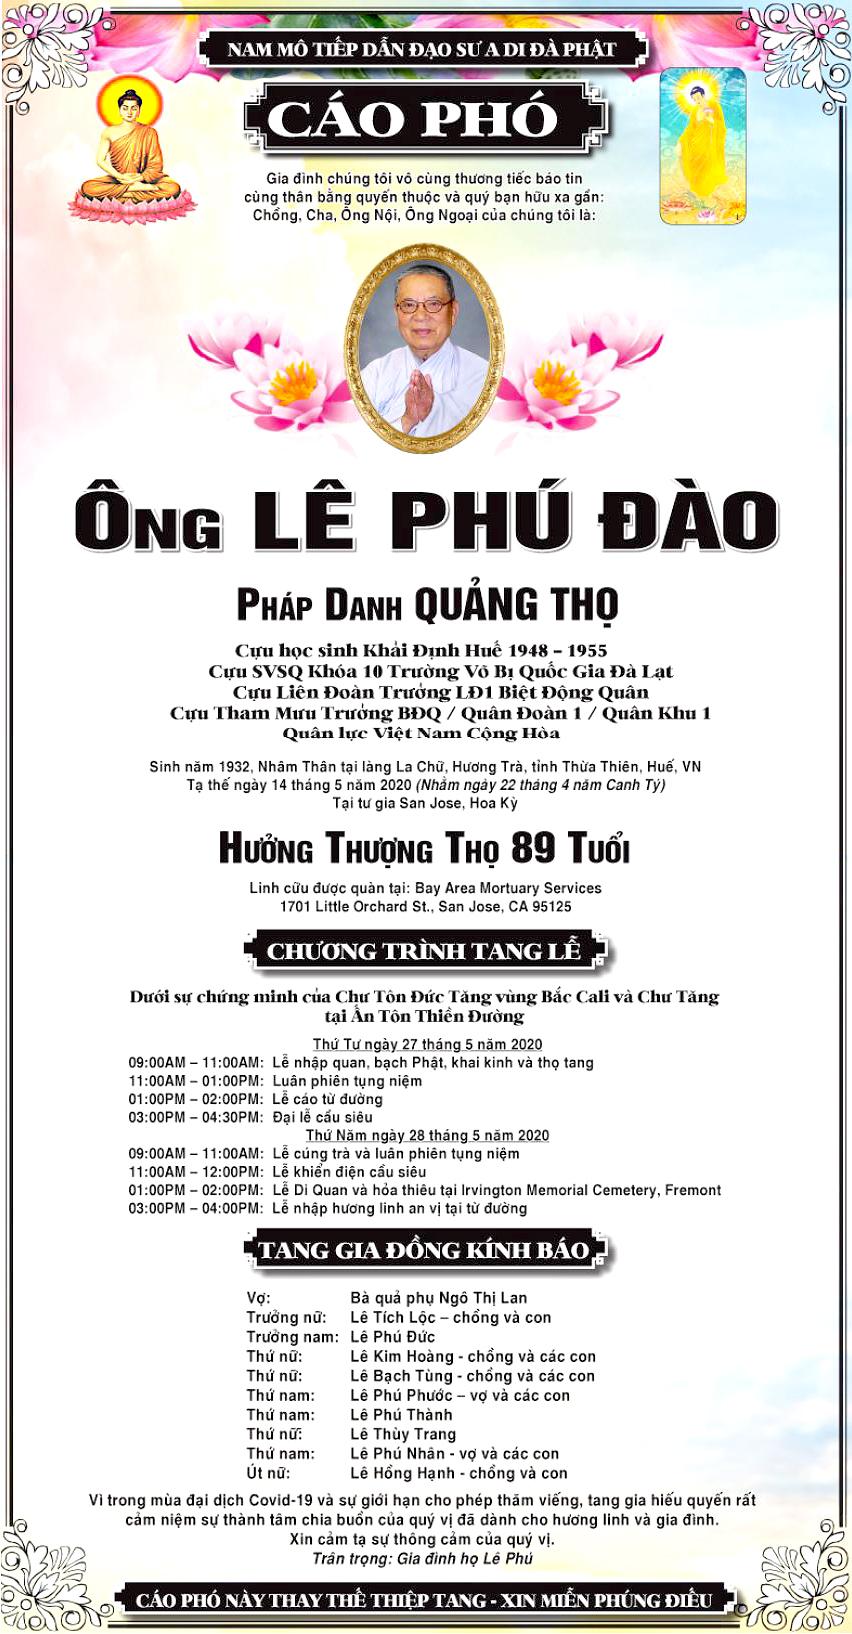 CP-AnhLePhuDao-K10